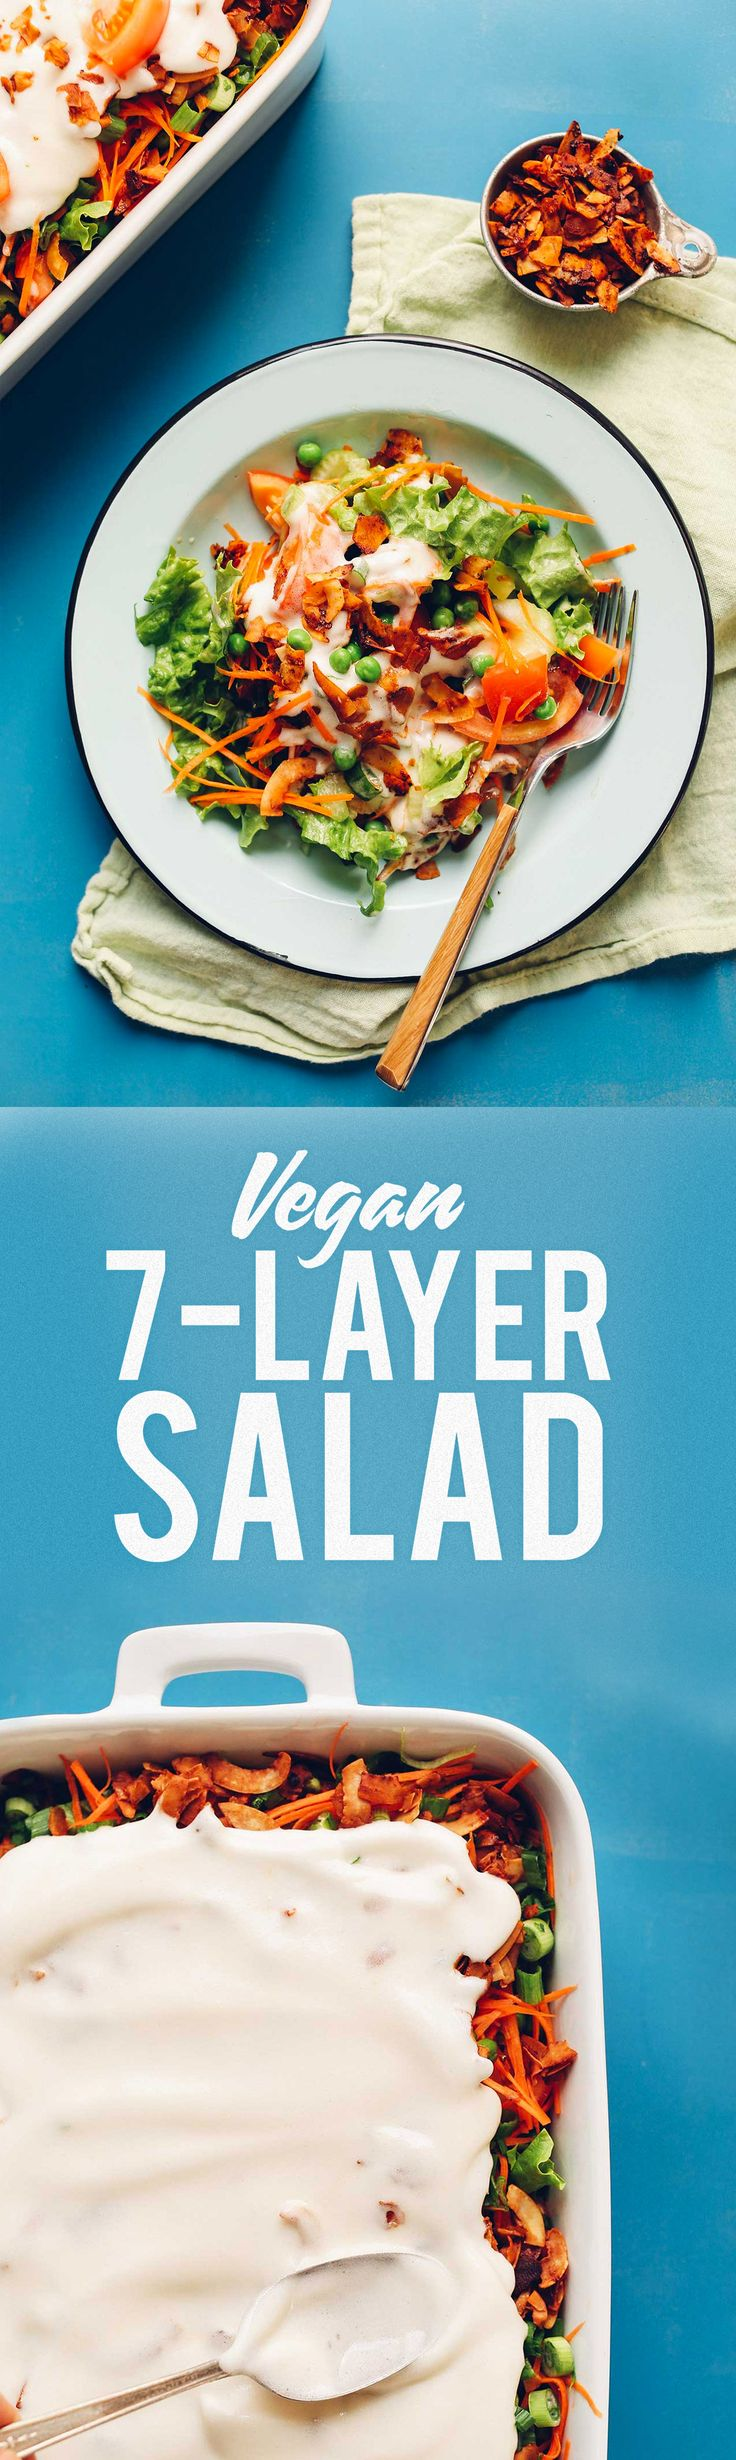 Vegan 7-Layer Salad Recipe! This classic salad gets a modern, healthy twist!